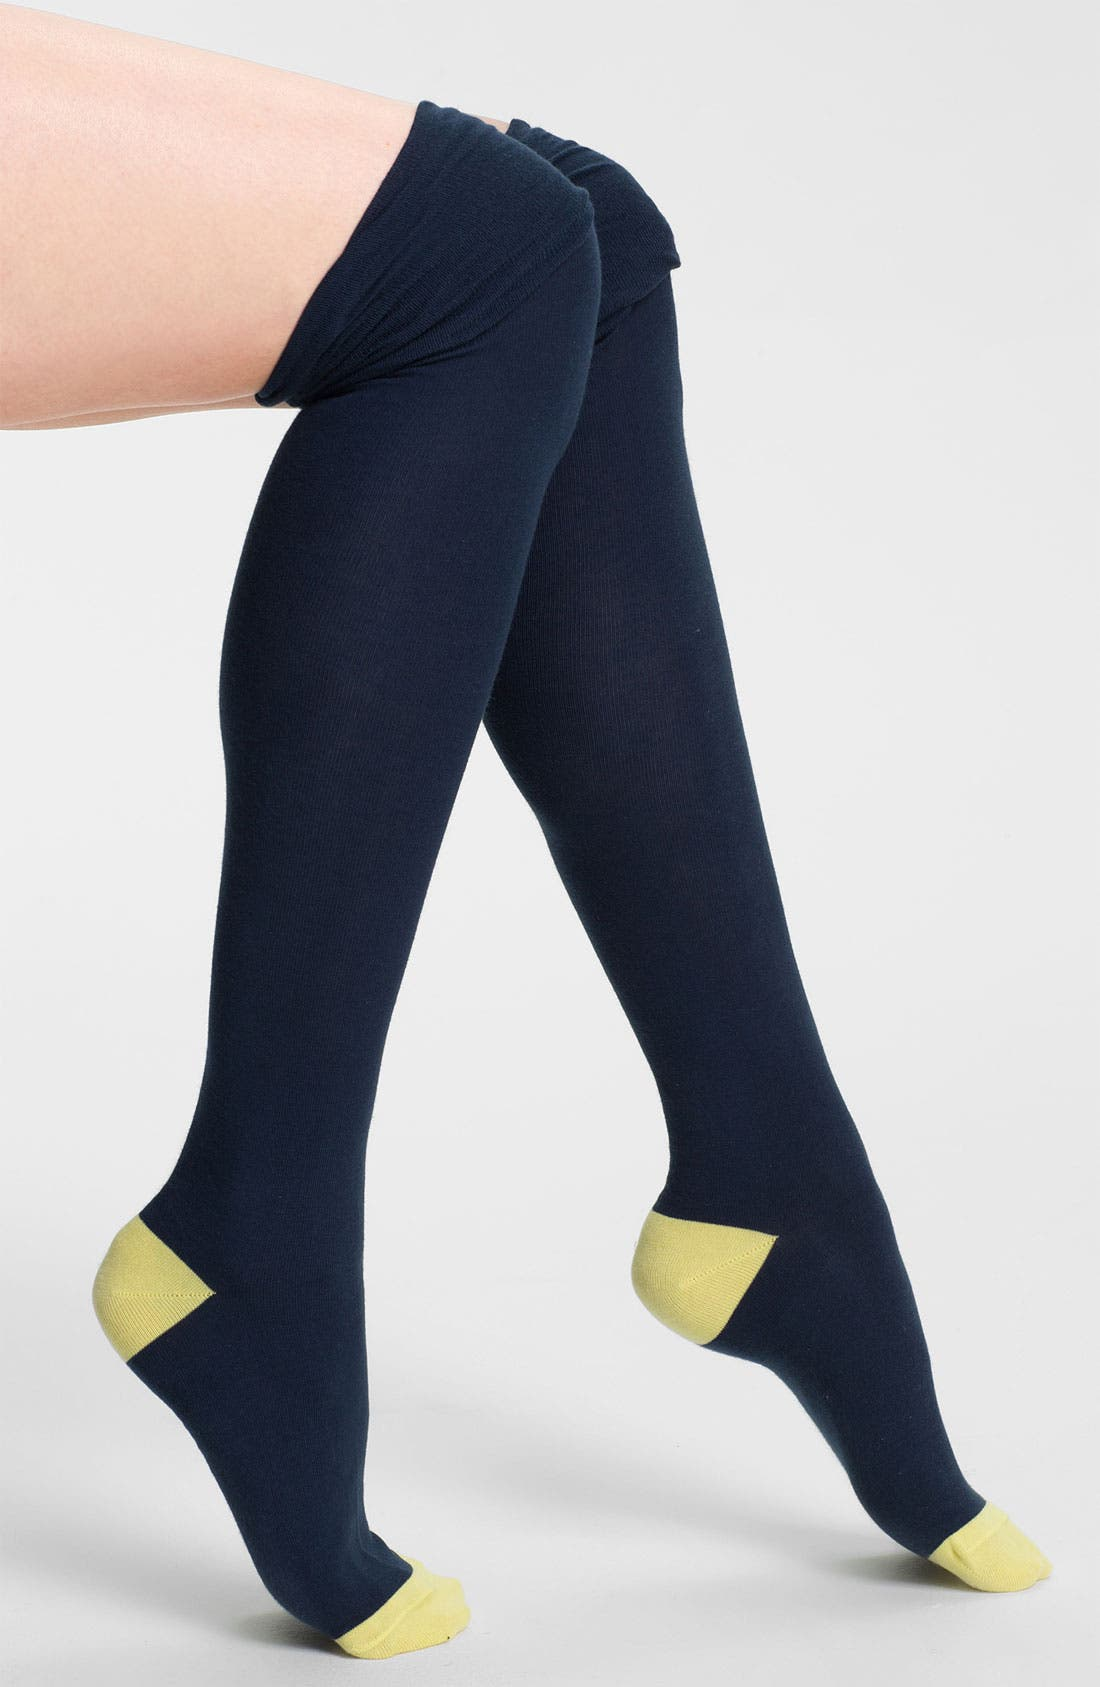 Main Image - Nordstrom 'Tip Top' Over the Knee Socks